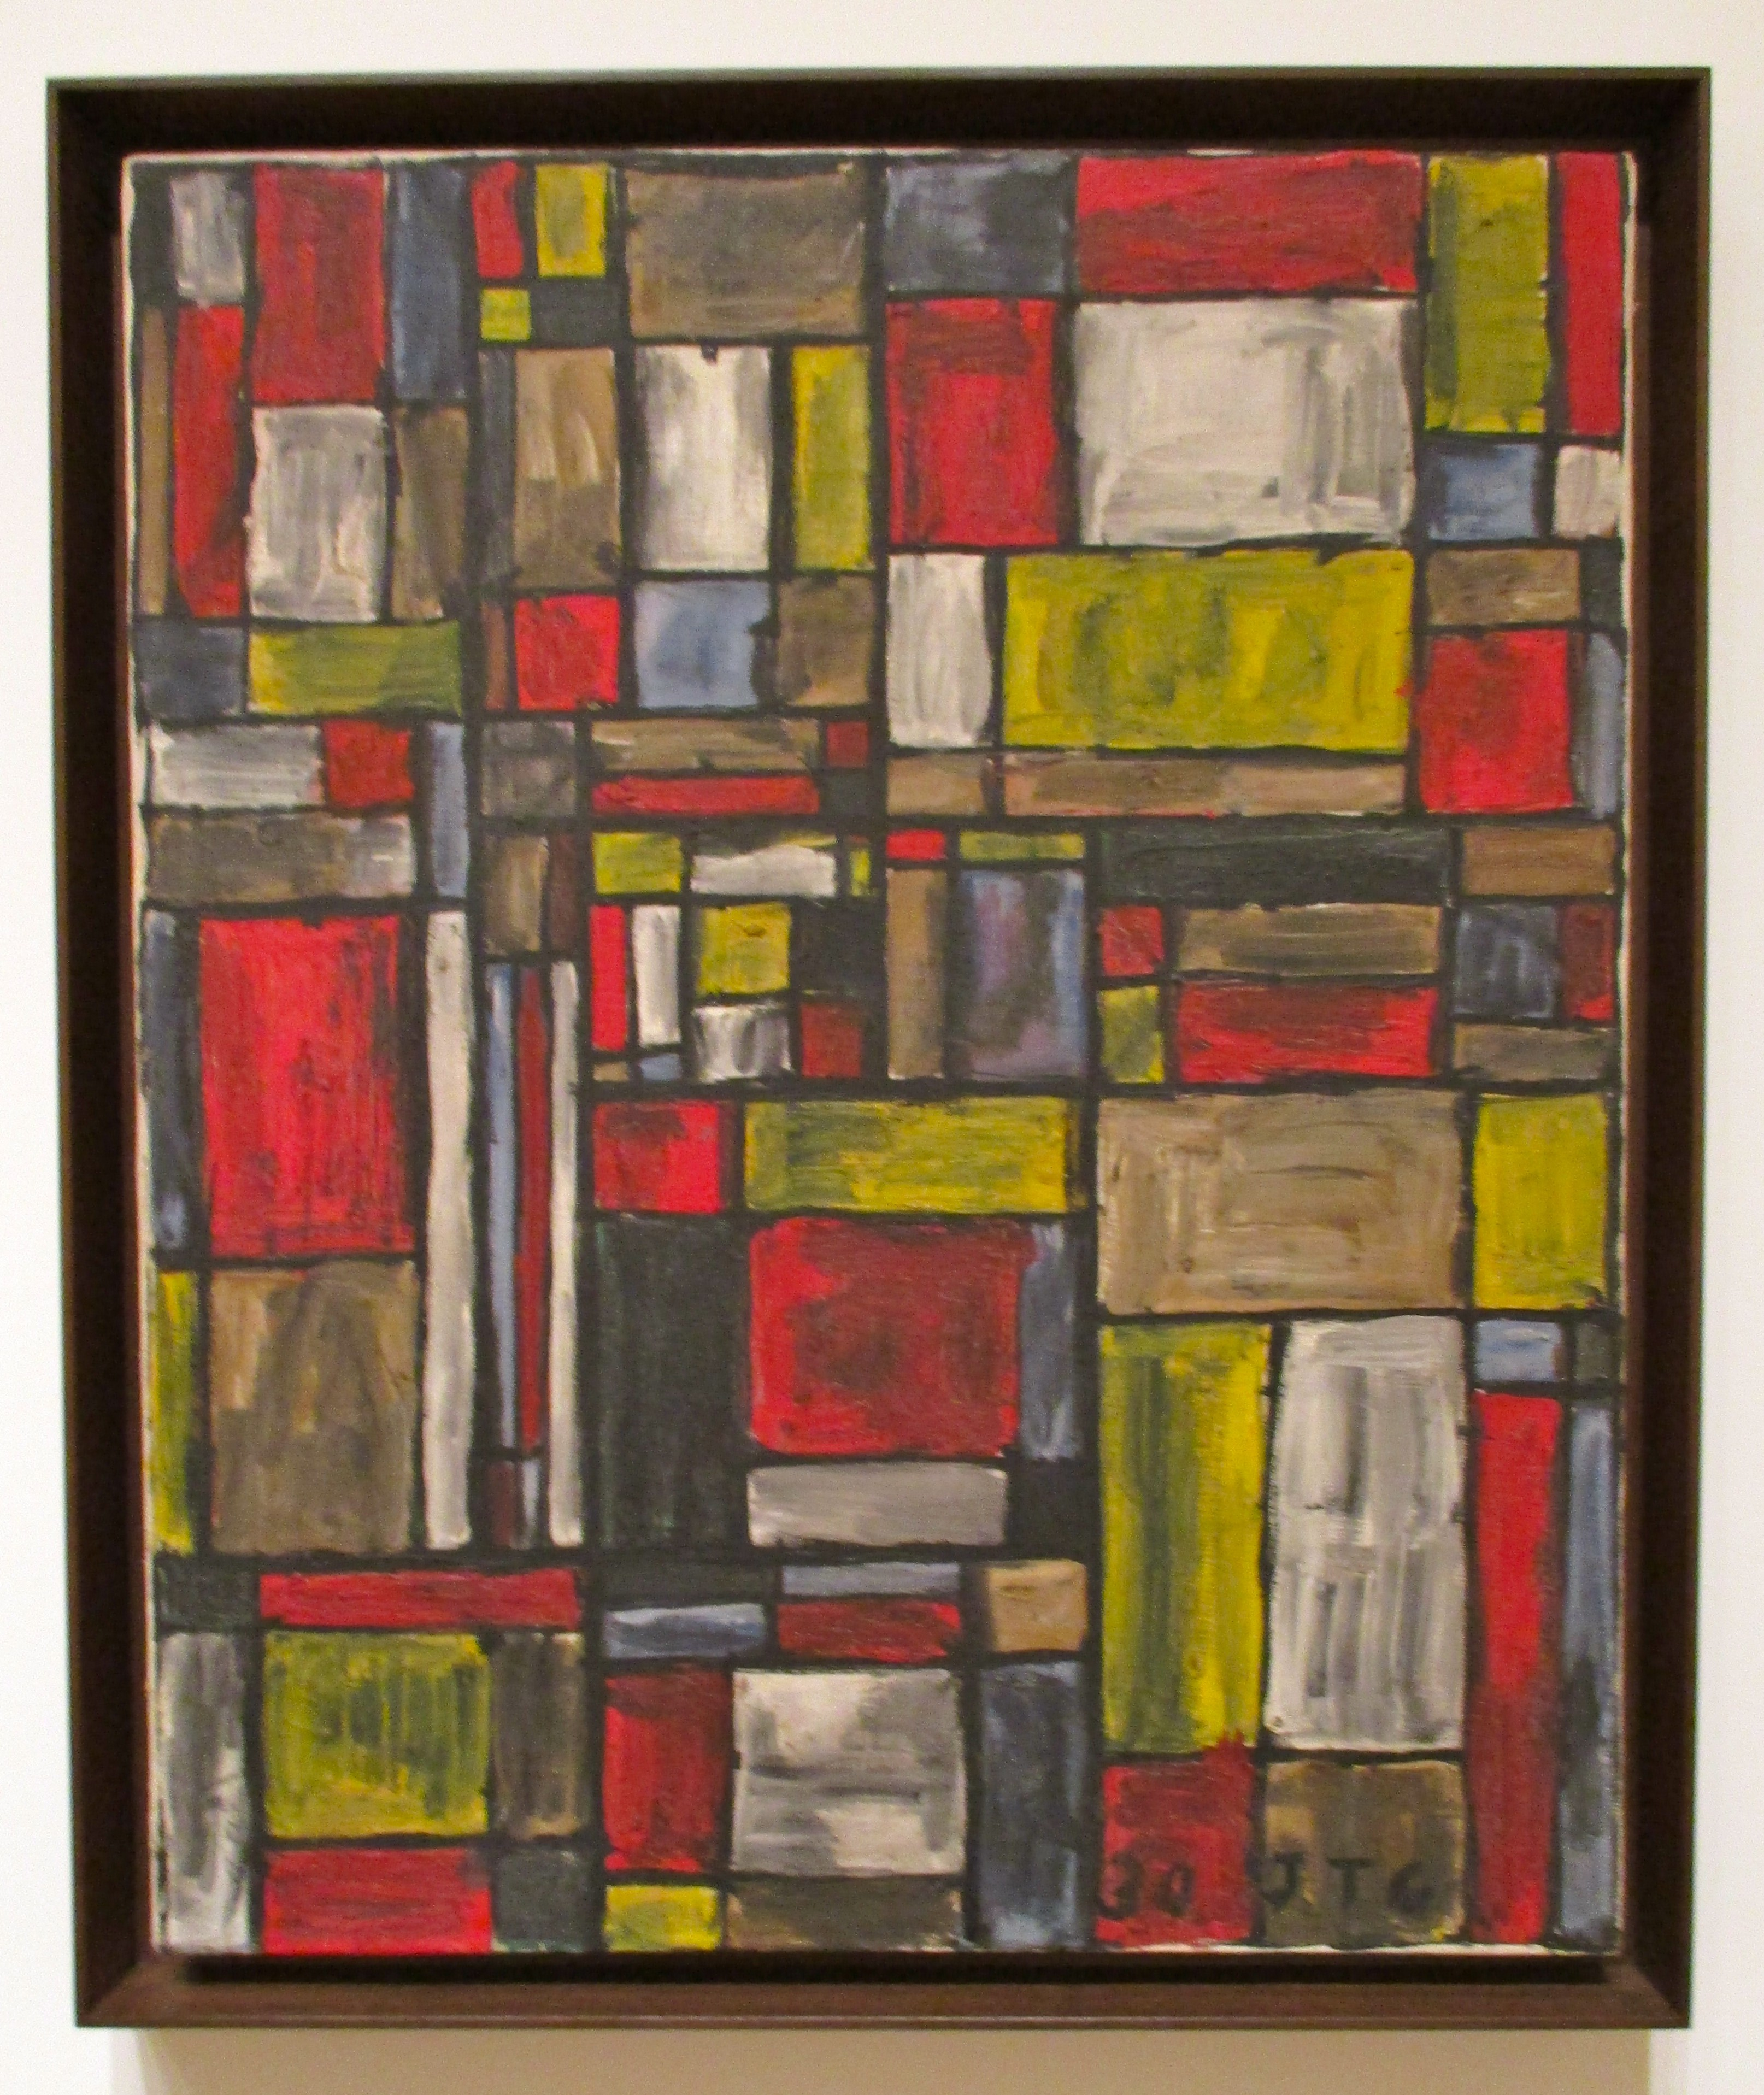 Modern Art Monday Presents: Joaquin Torres-Garcia